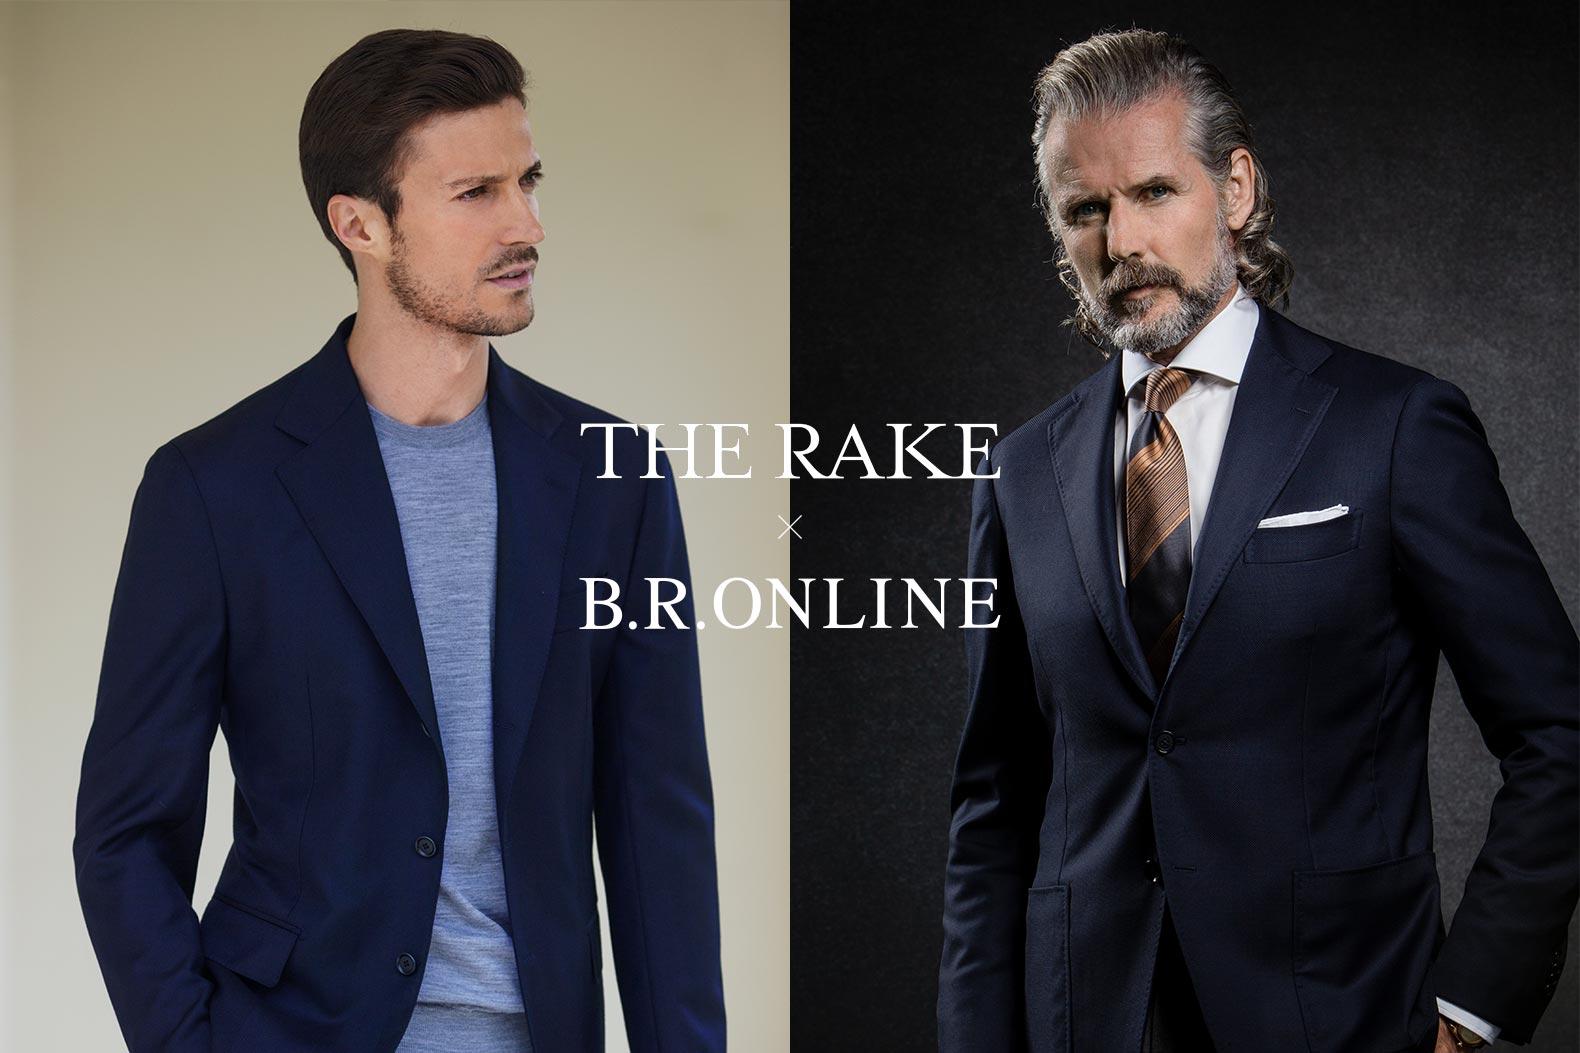 "THE RAKE ×B.R.ONLINE ""ともに推す""この一品は、デ・ペトリロとリングヂャケット"